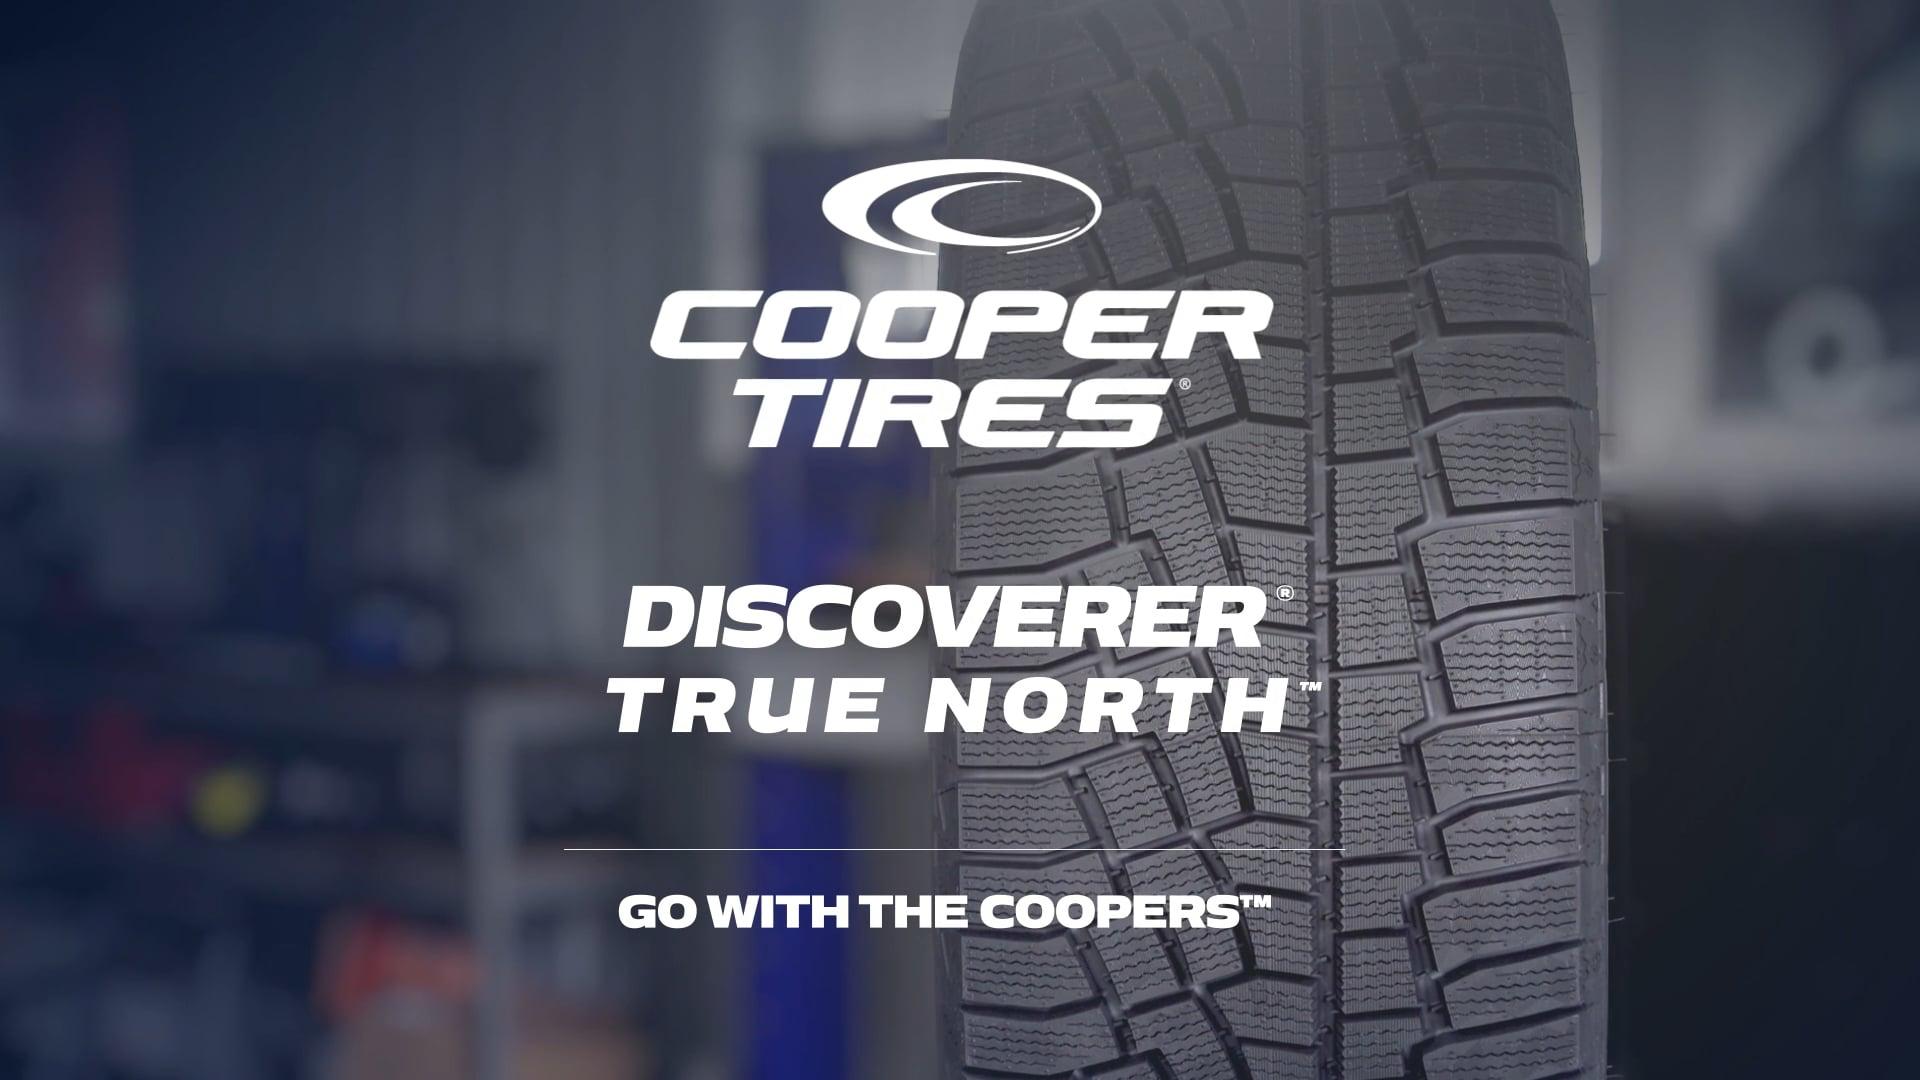 CooperTires True North